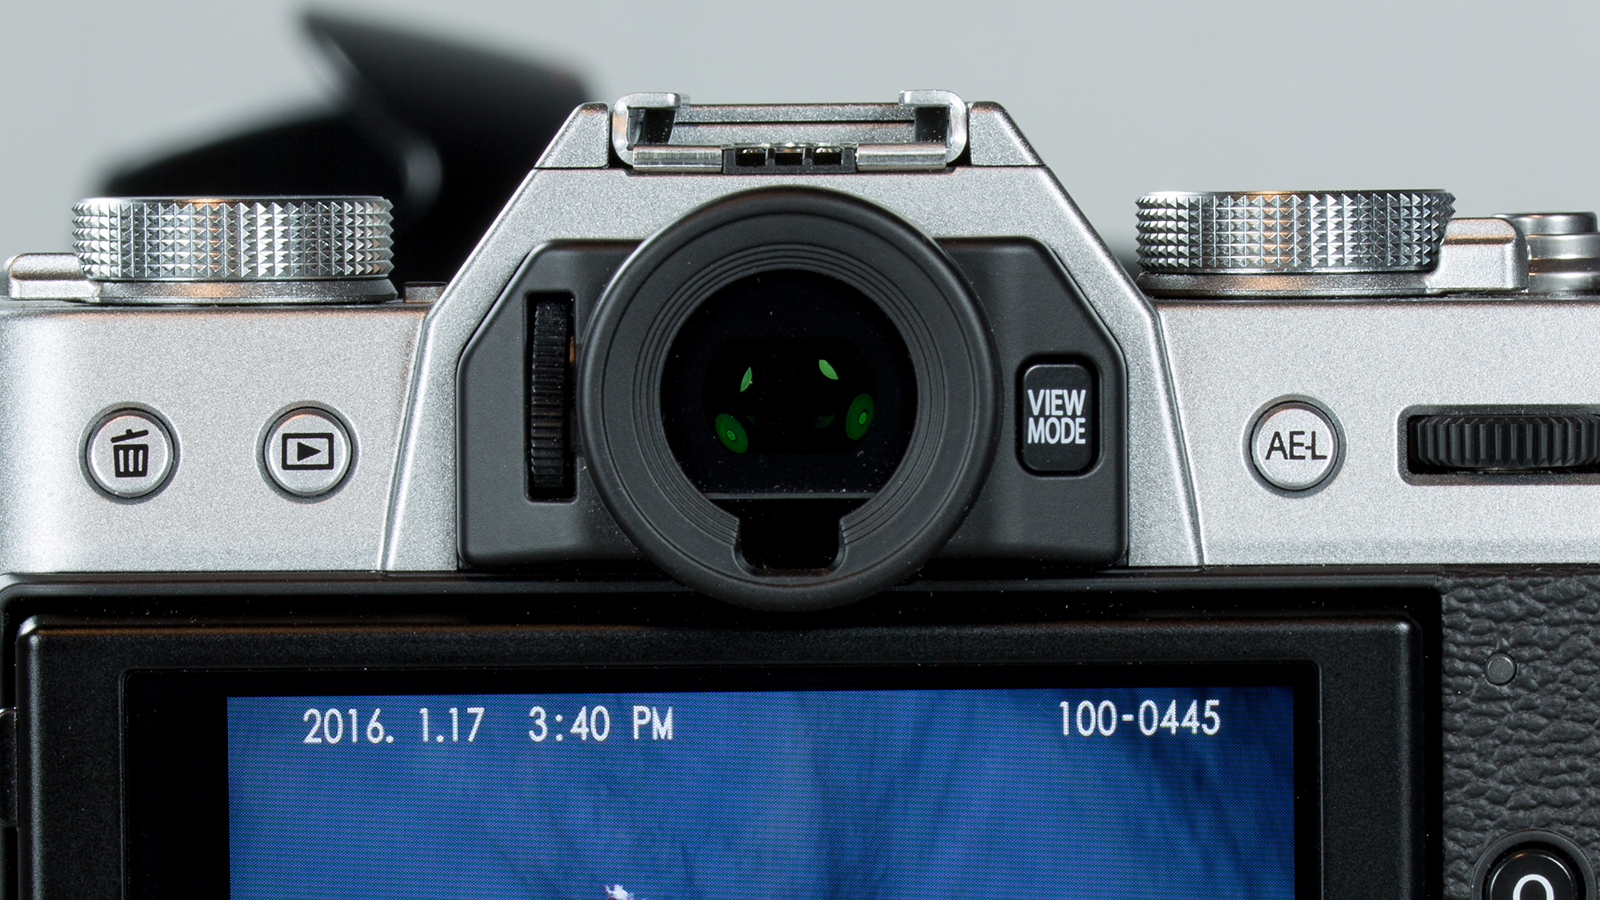 Fujifilm-X-T10-DT-009-EVF